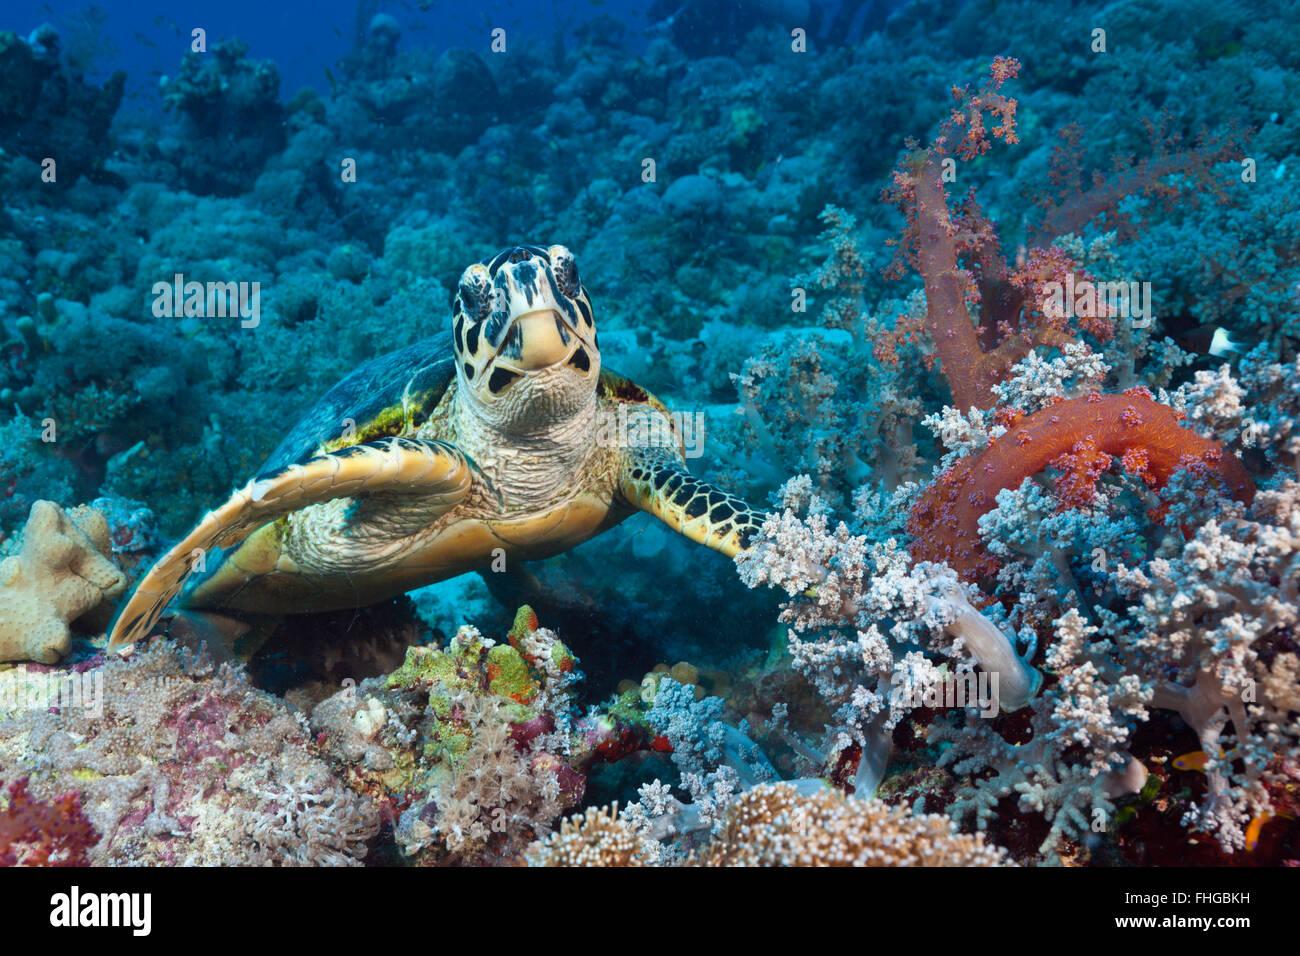 Hawksbill Sea Turtle, Eretmochelys imbricata, Red Sea, Ras Mohammed, Egypt - Stock Image